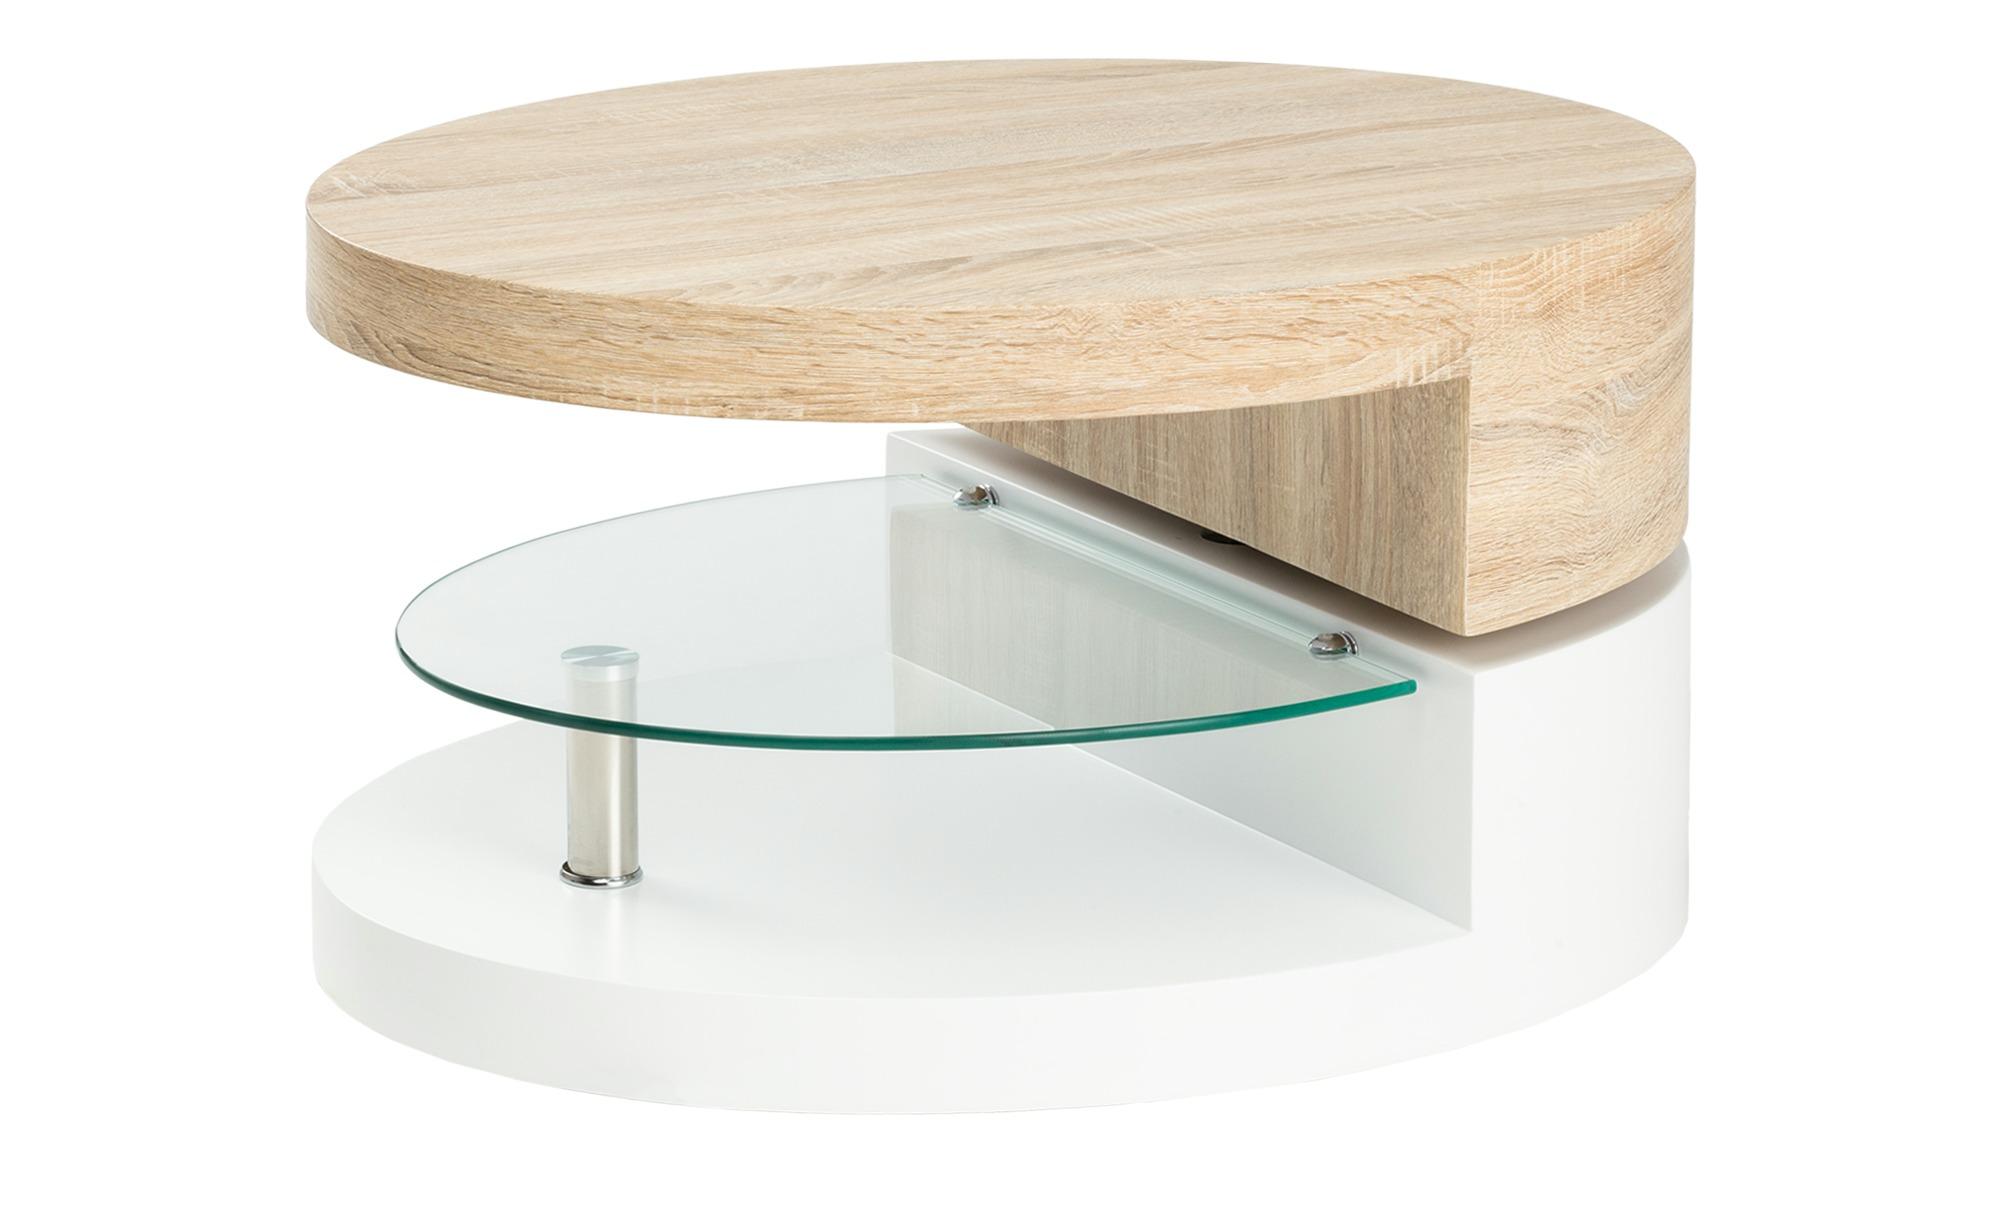 Couchtisch oval drehbar  Burano ¦ mehrfarbig ¦ Maße (cm): B: 60 H: 43 Tische > Couchtische > Couchtische andere Formen - Höffner